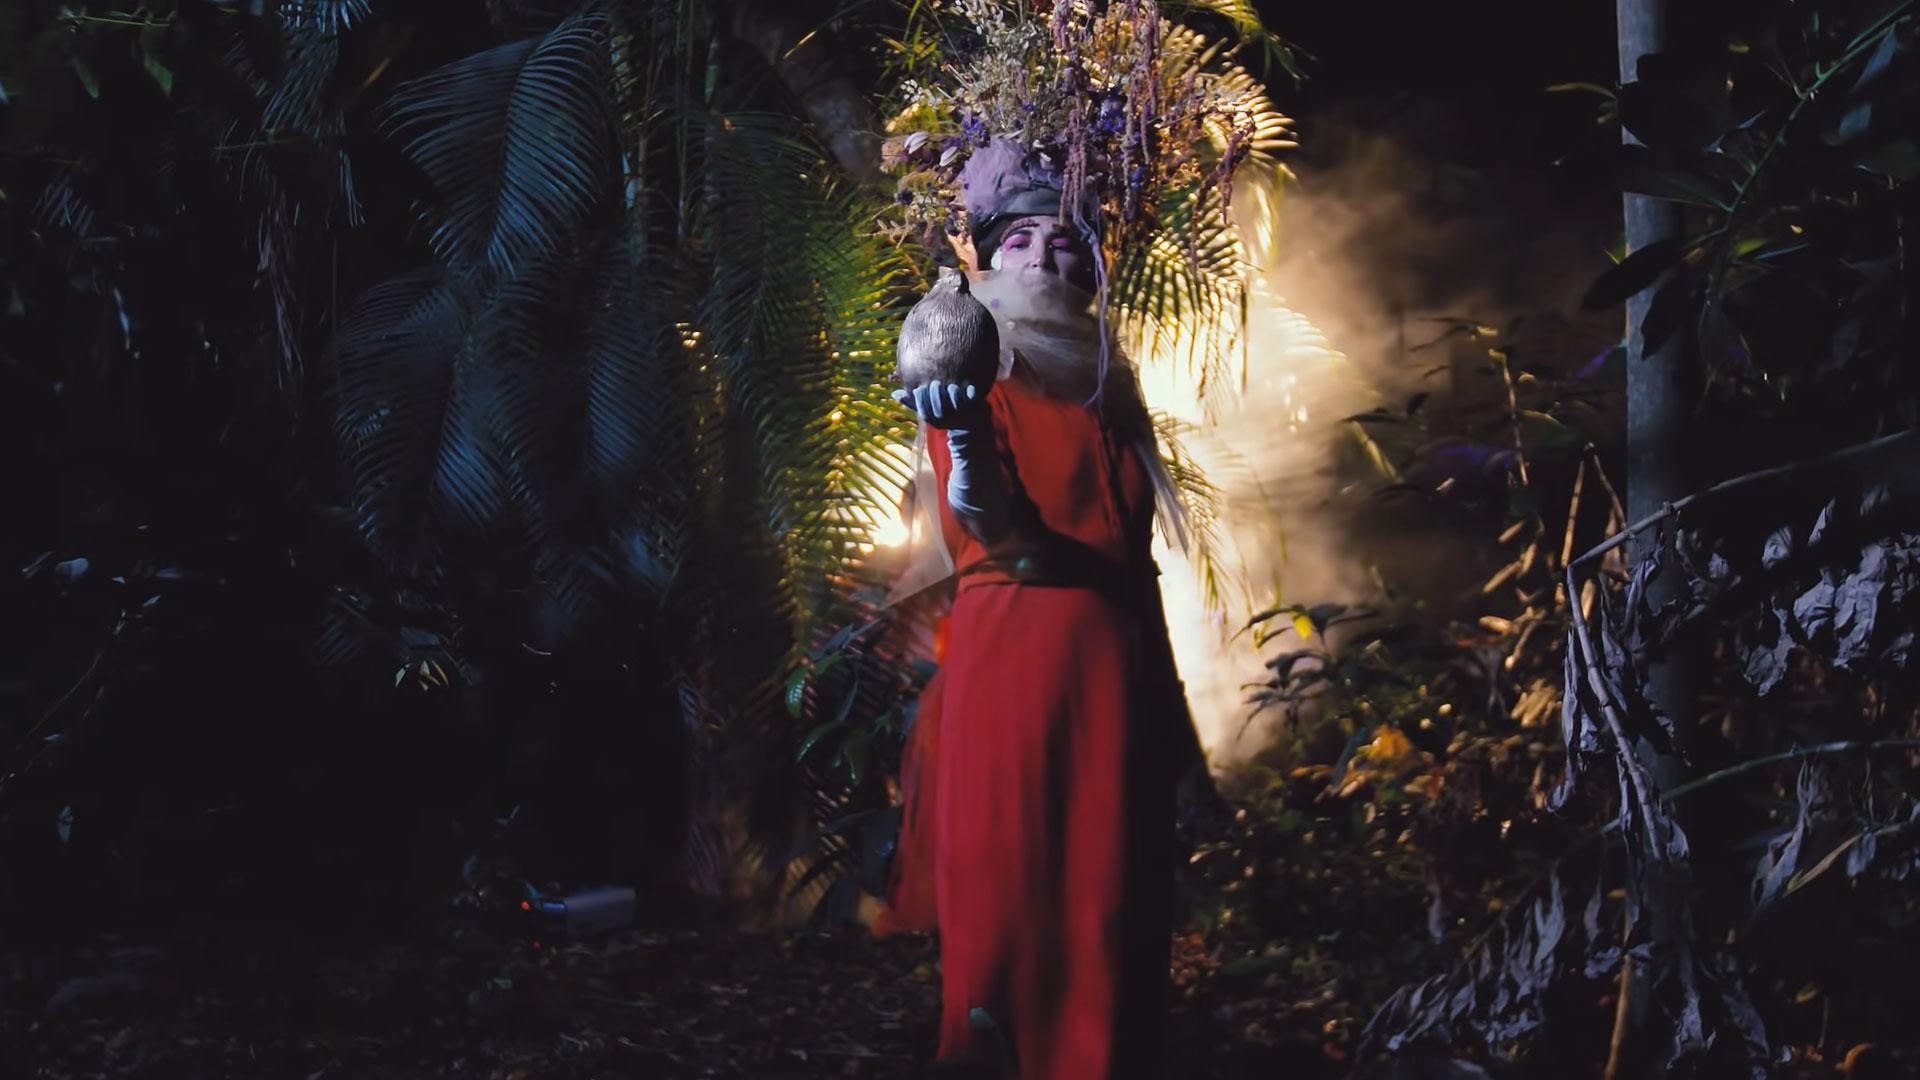 Night Heron - Dreamz Music Video